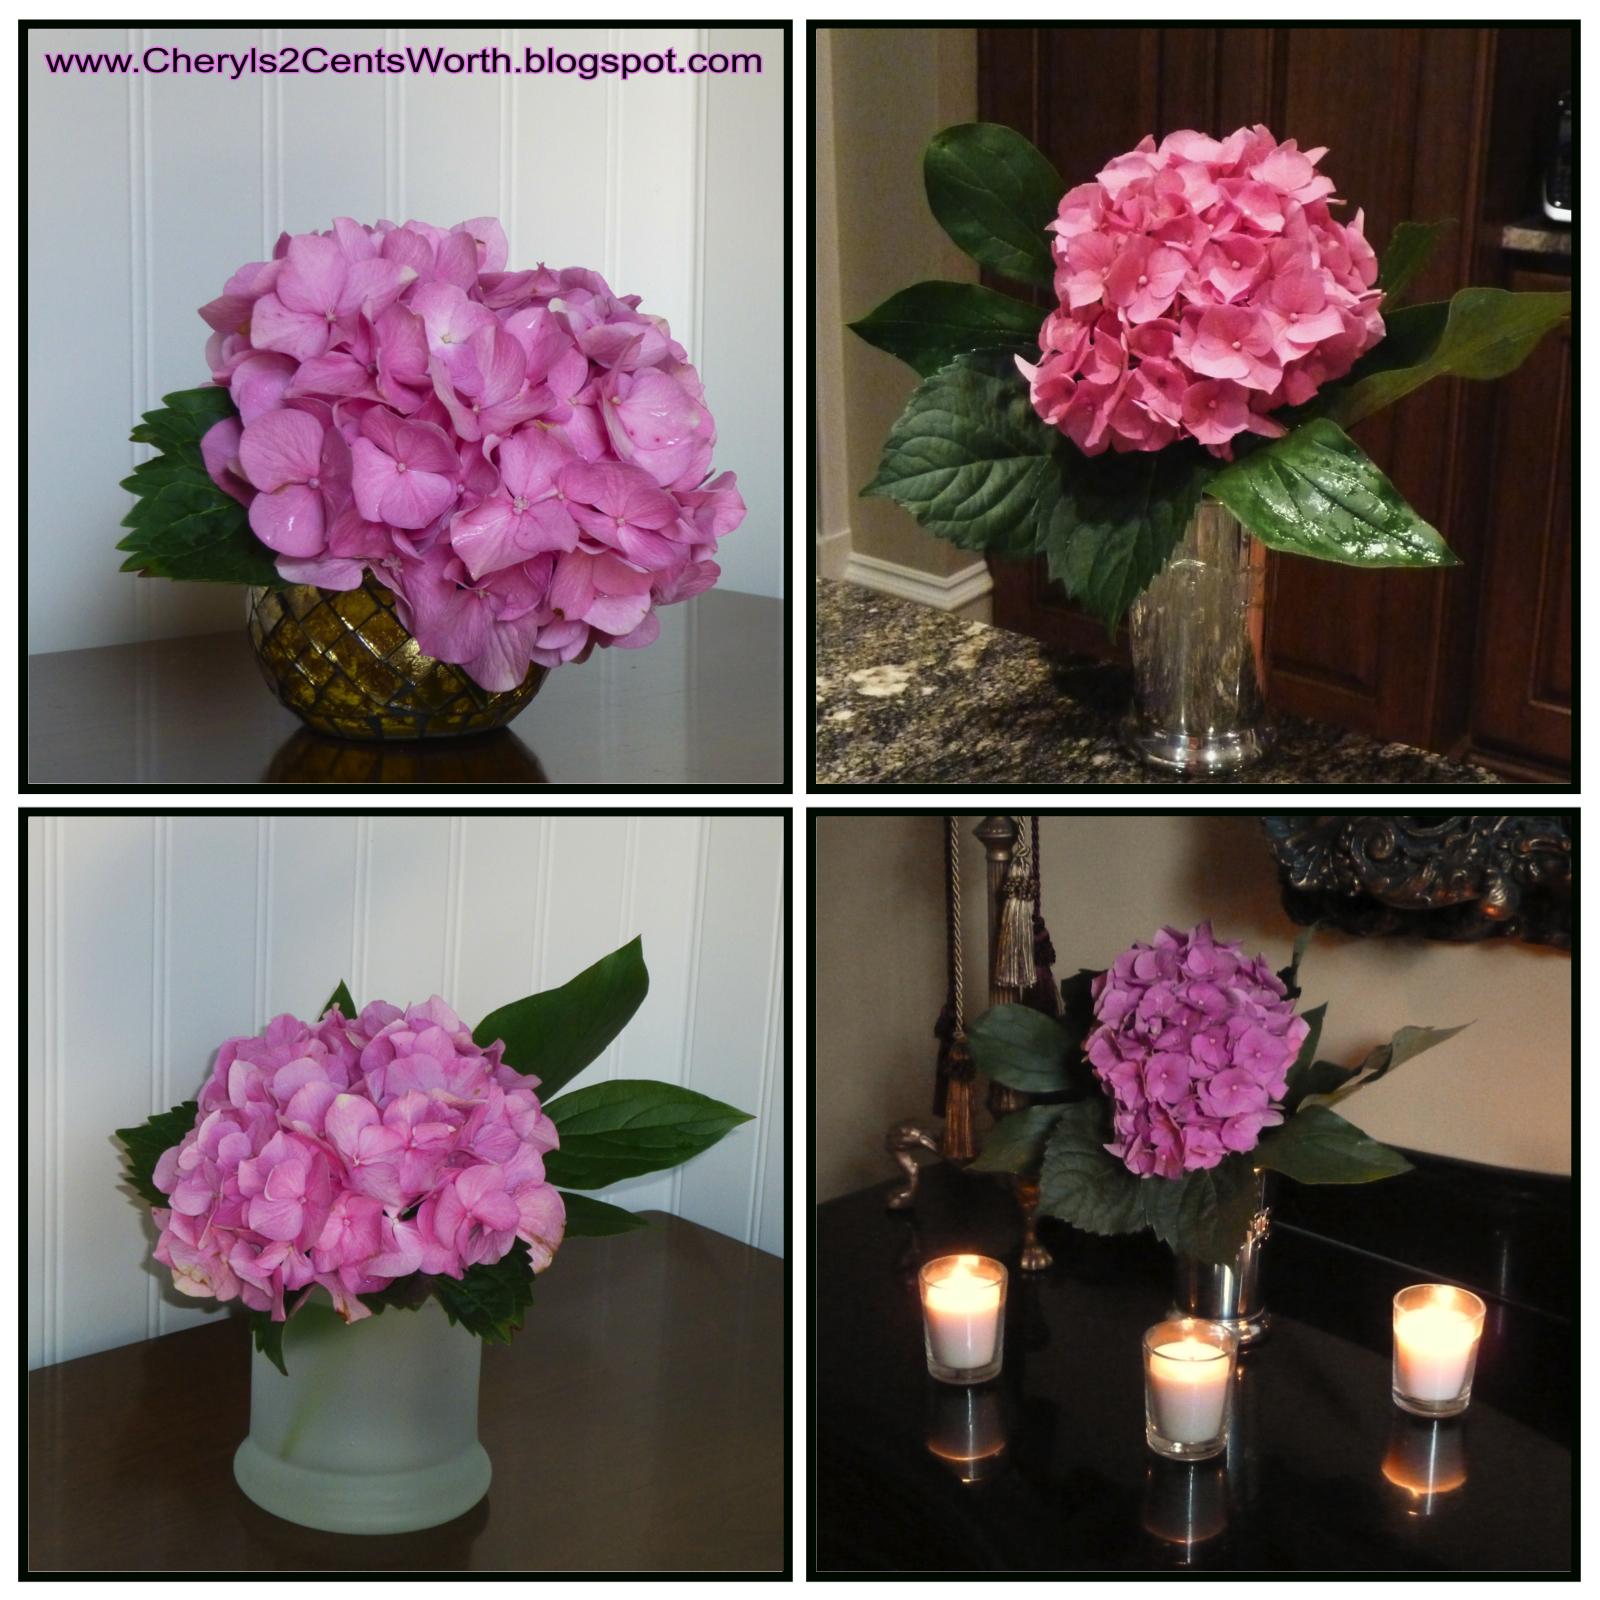 b3ca70a9c74e Cheryl s 2 Cents  Worth  Mini Flower Arrangements and Simple ...